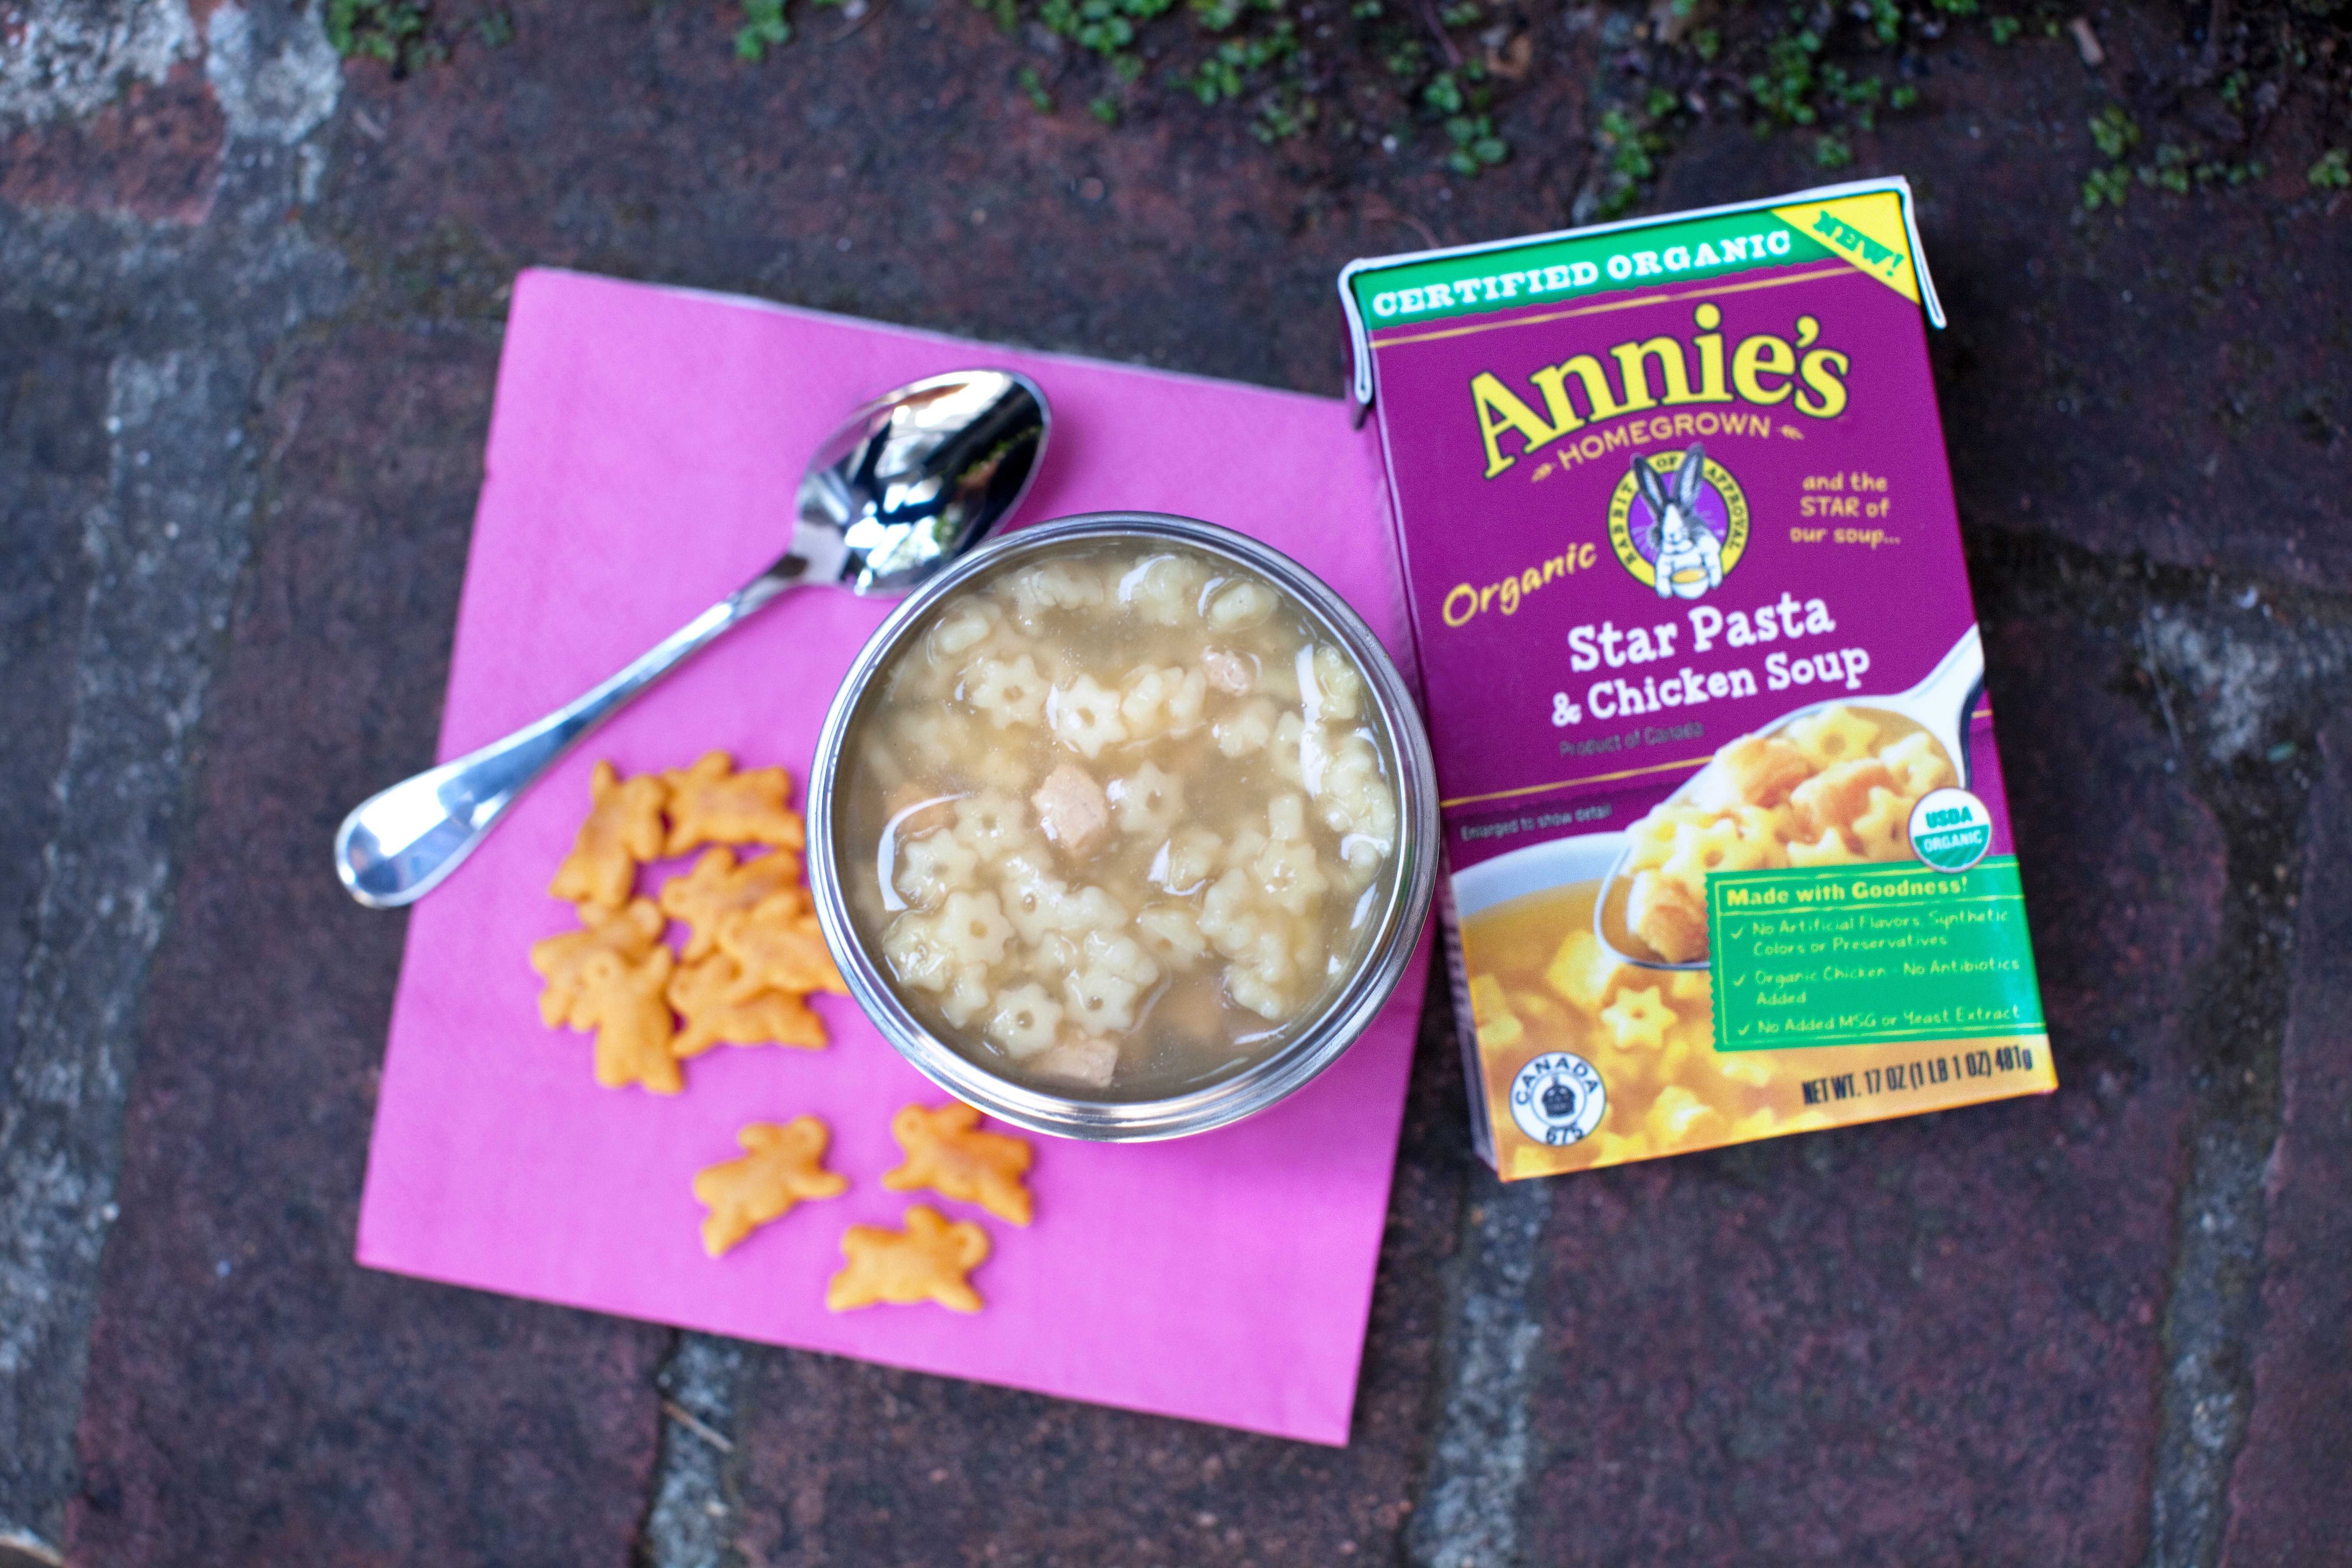 Annies Homegrown Organic Soups